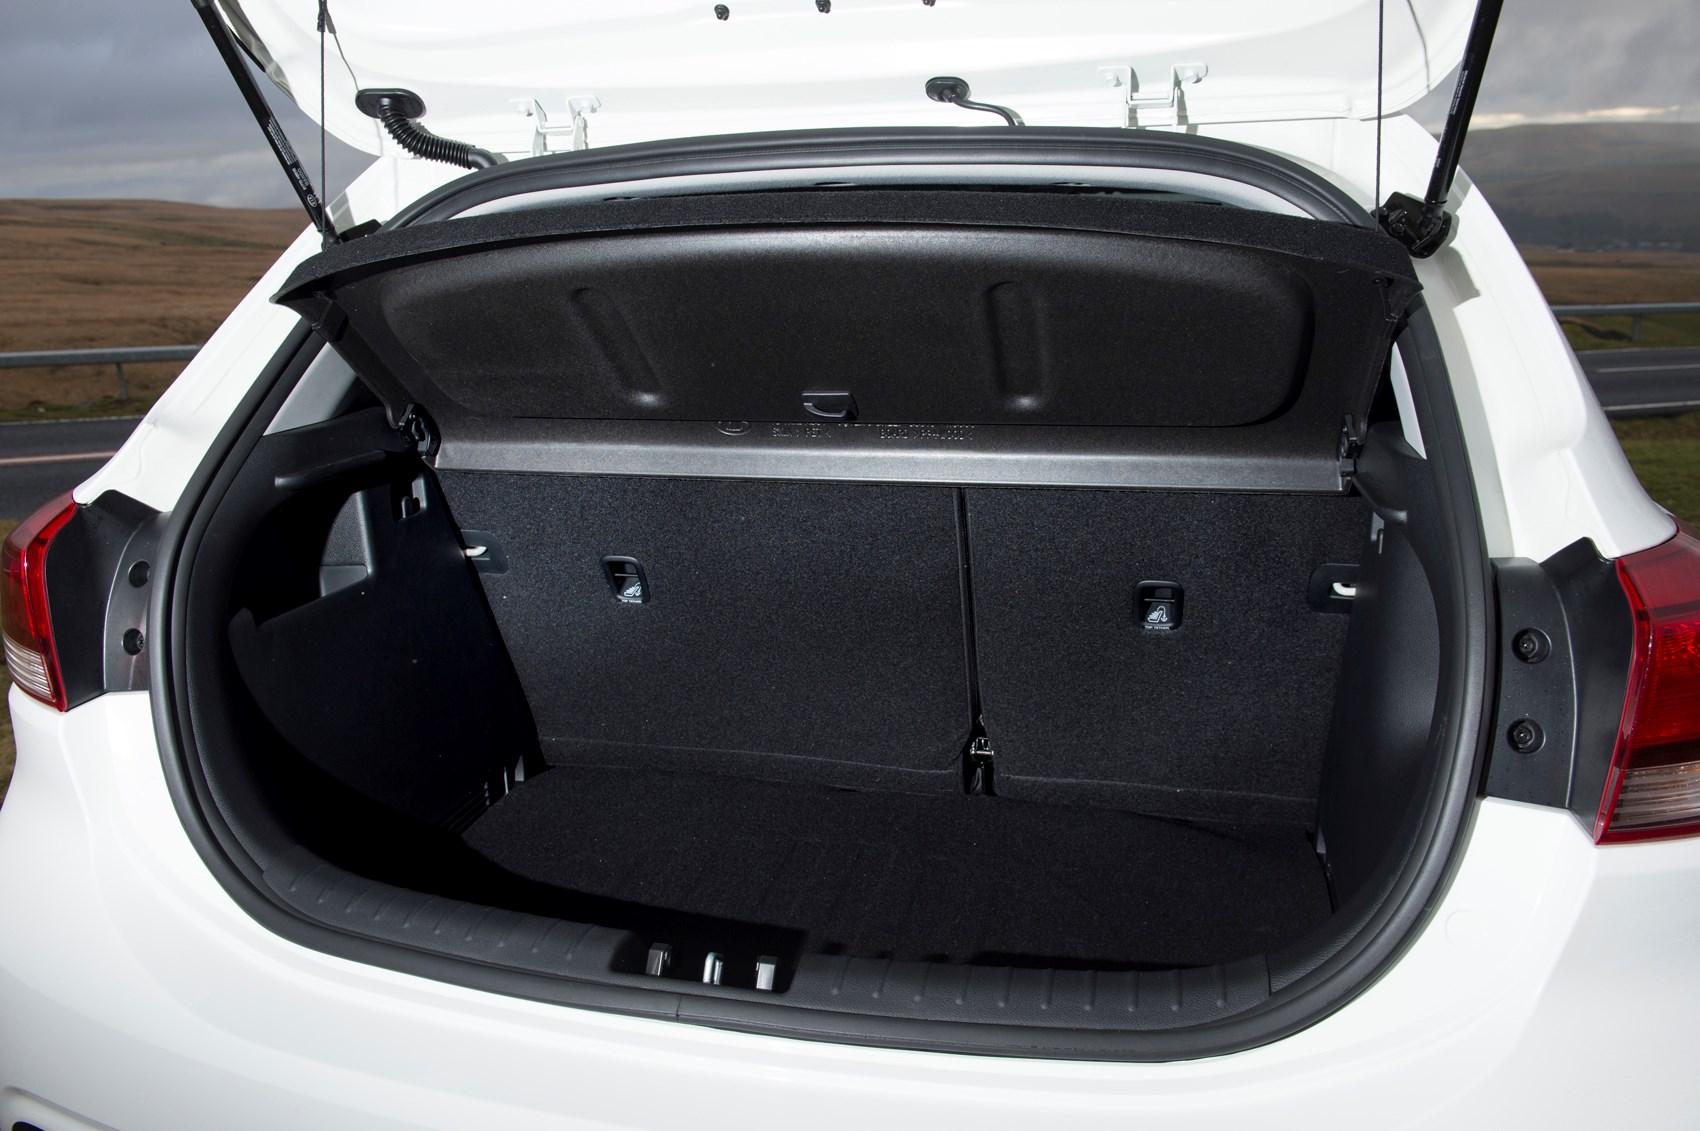 Kia 2017 Rio Hatchback Boot Load E